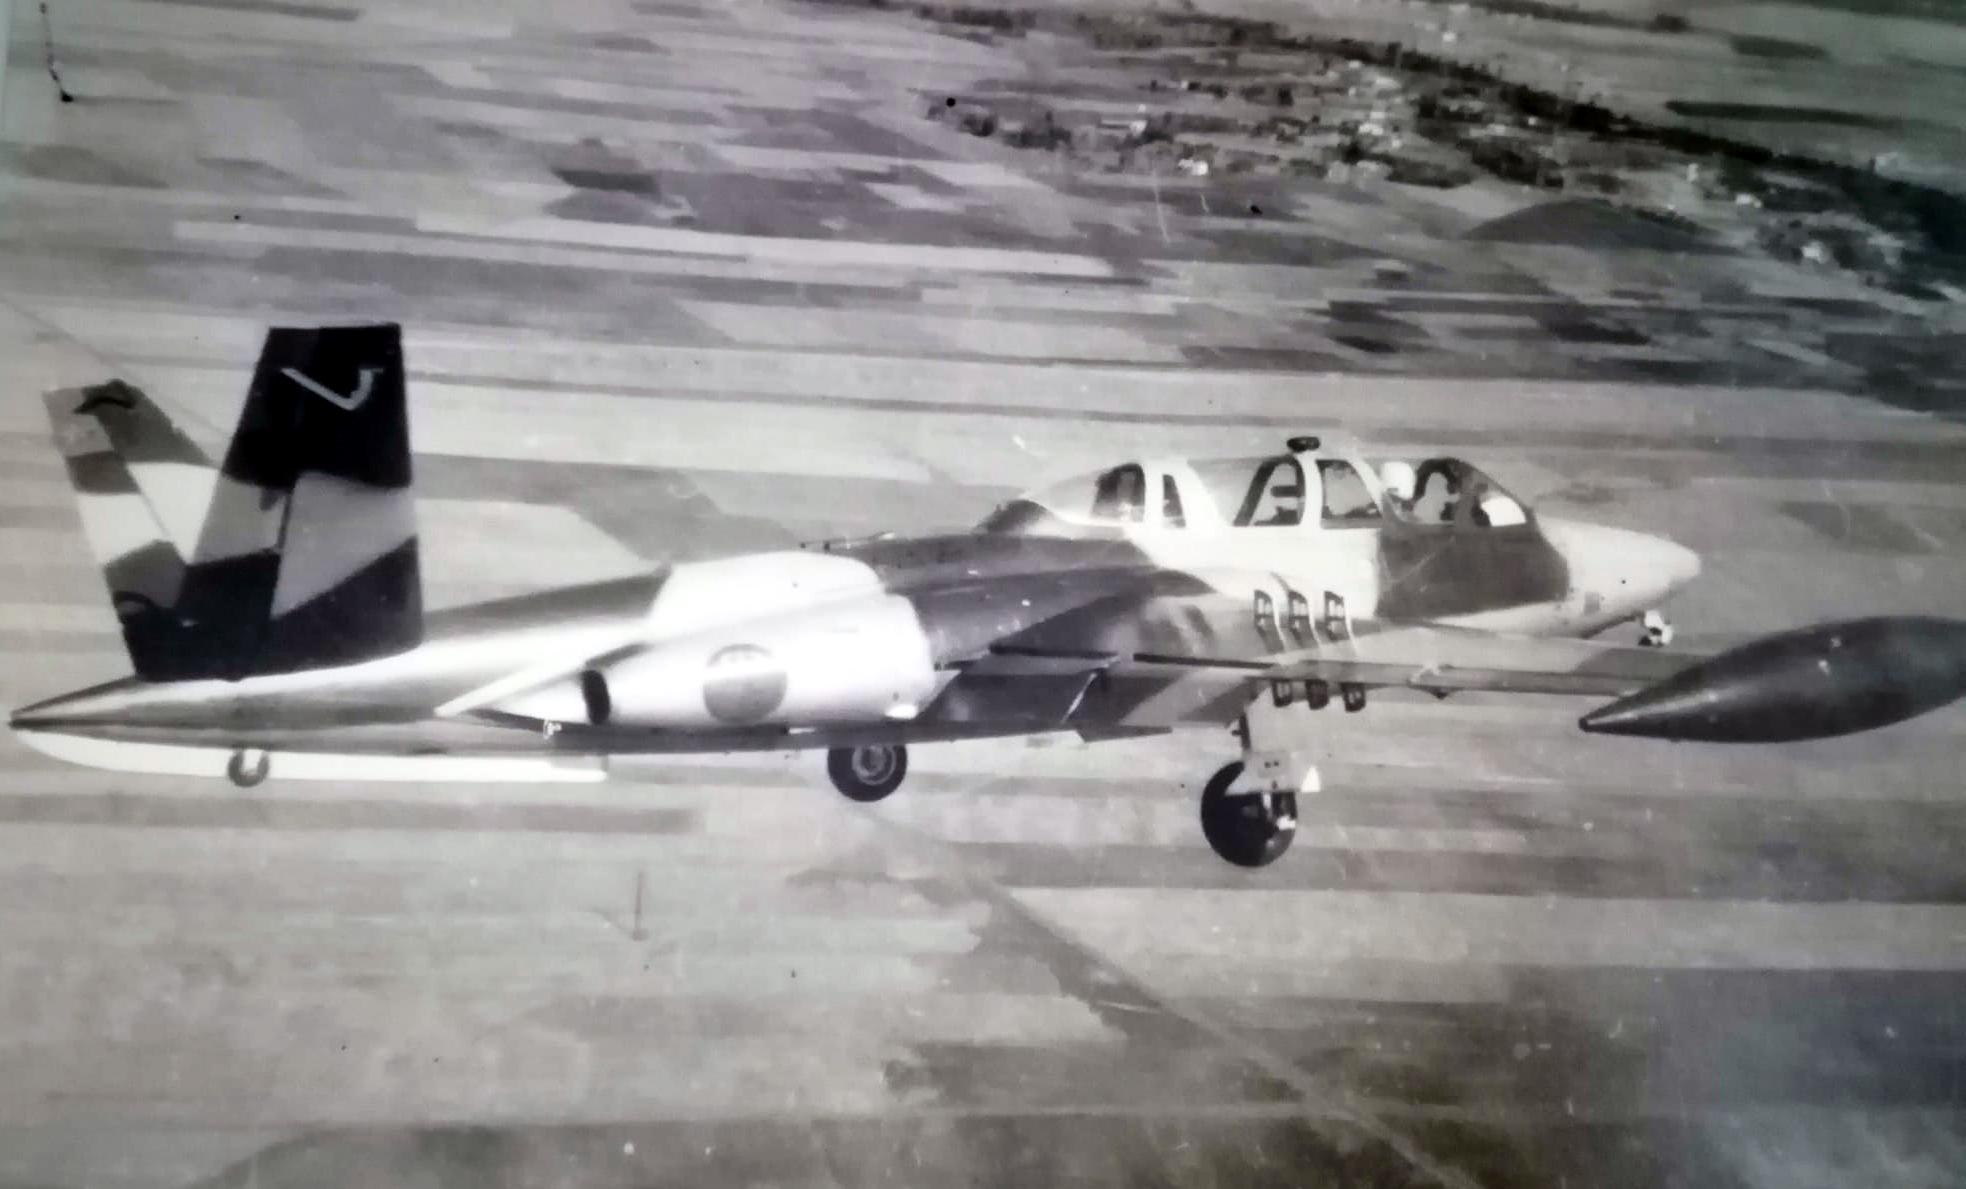 FRA: Photos anciens avions des FRA - Page 12 Clipb243